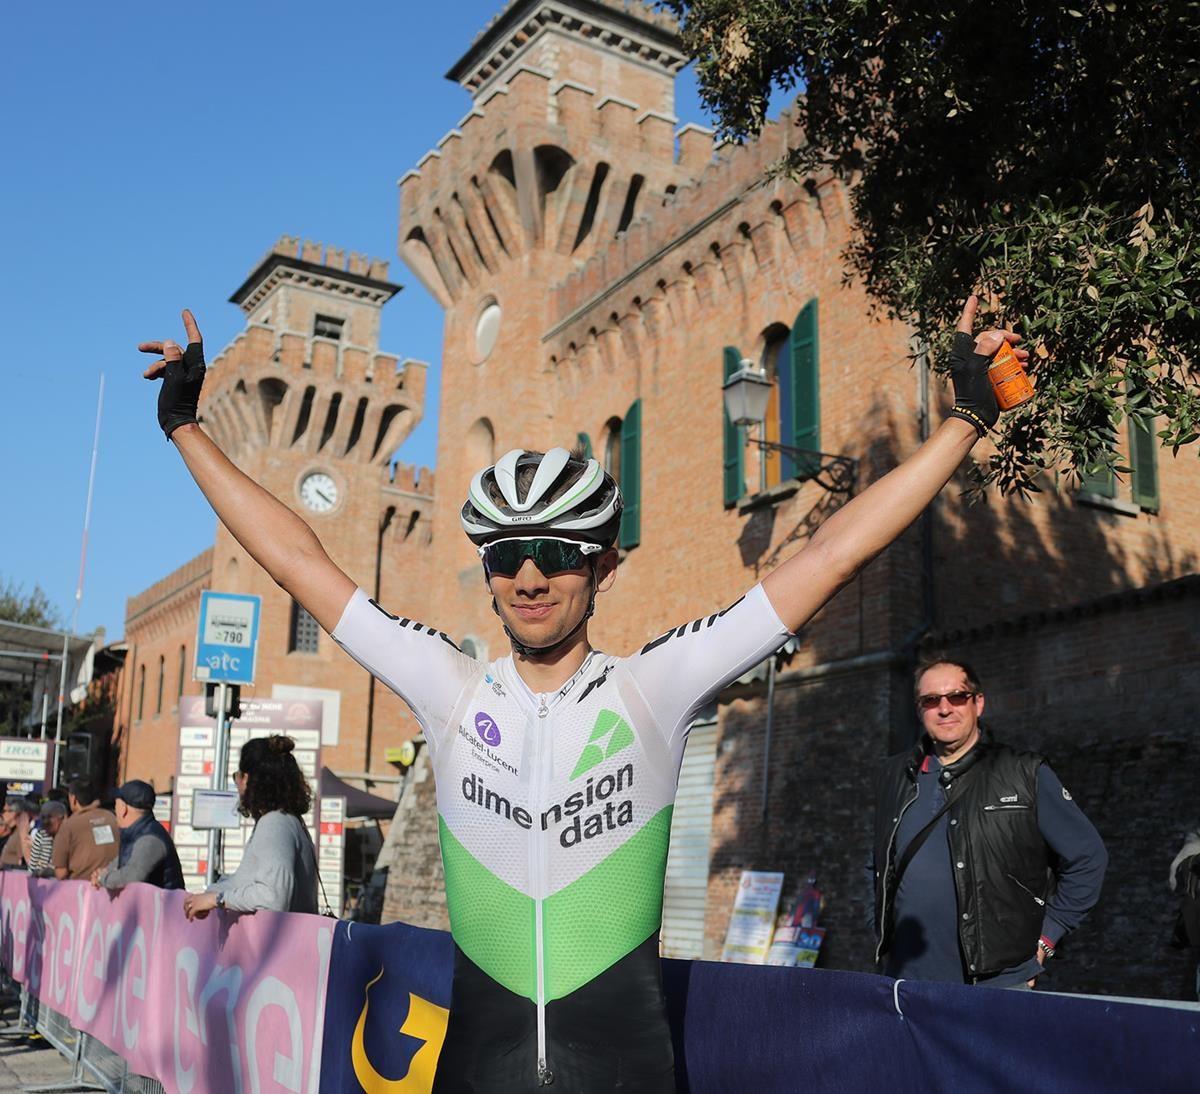 Matteo Sobrero festeggia la vittoria alla Strade Bianche di Romagna 2019 (foto Isolapress - Marco Isola - Massimo Fulgenzi)